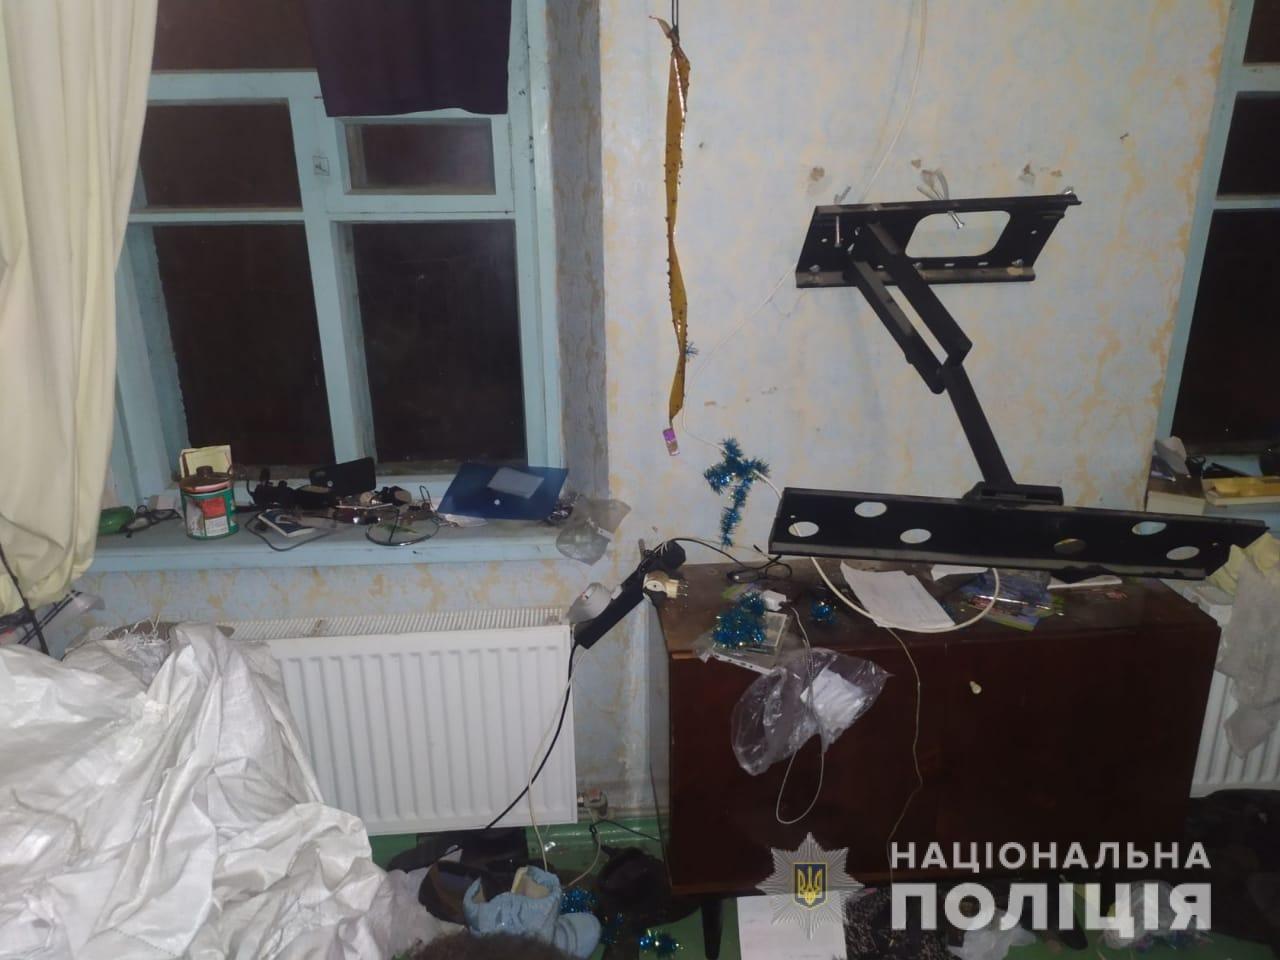 Избили и ограбили: под Днепром двое мужчин напали на 80-летнюю пенсионерку ночью, - ФОТО, фото-1